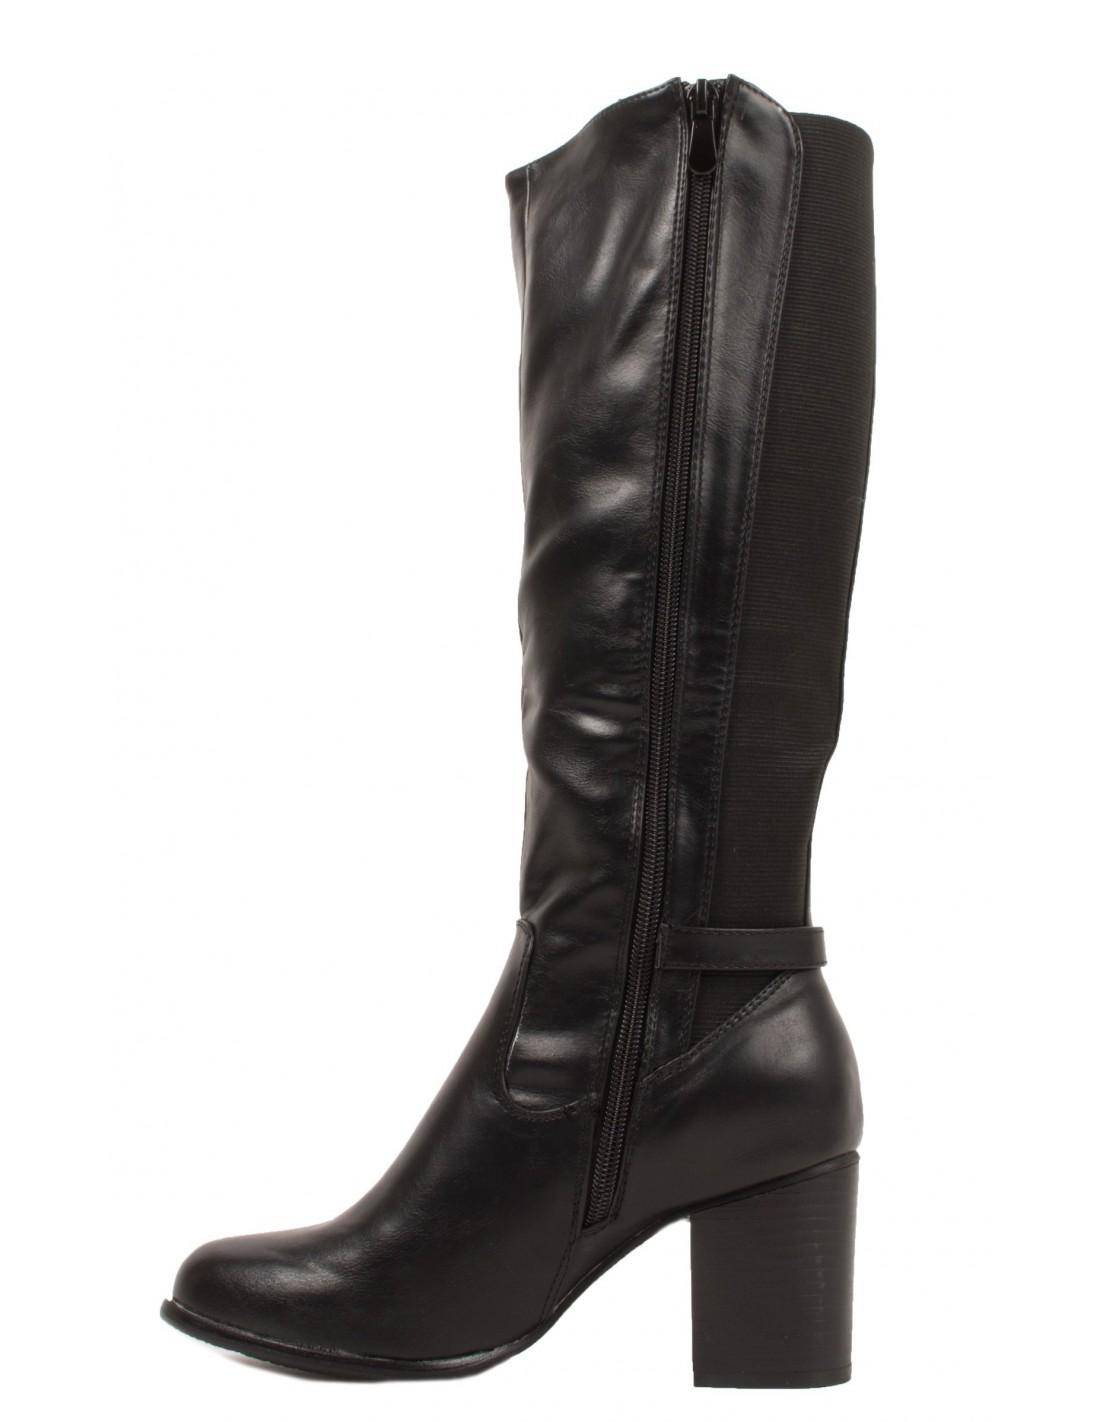 bottes cavali res lastique femme petit talon en simili cuir noir. Black Bedroom Furniture Sets. Home Design Ideas